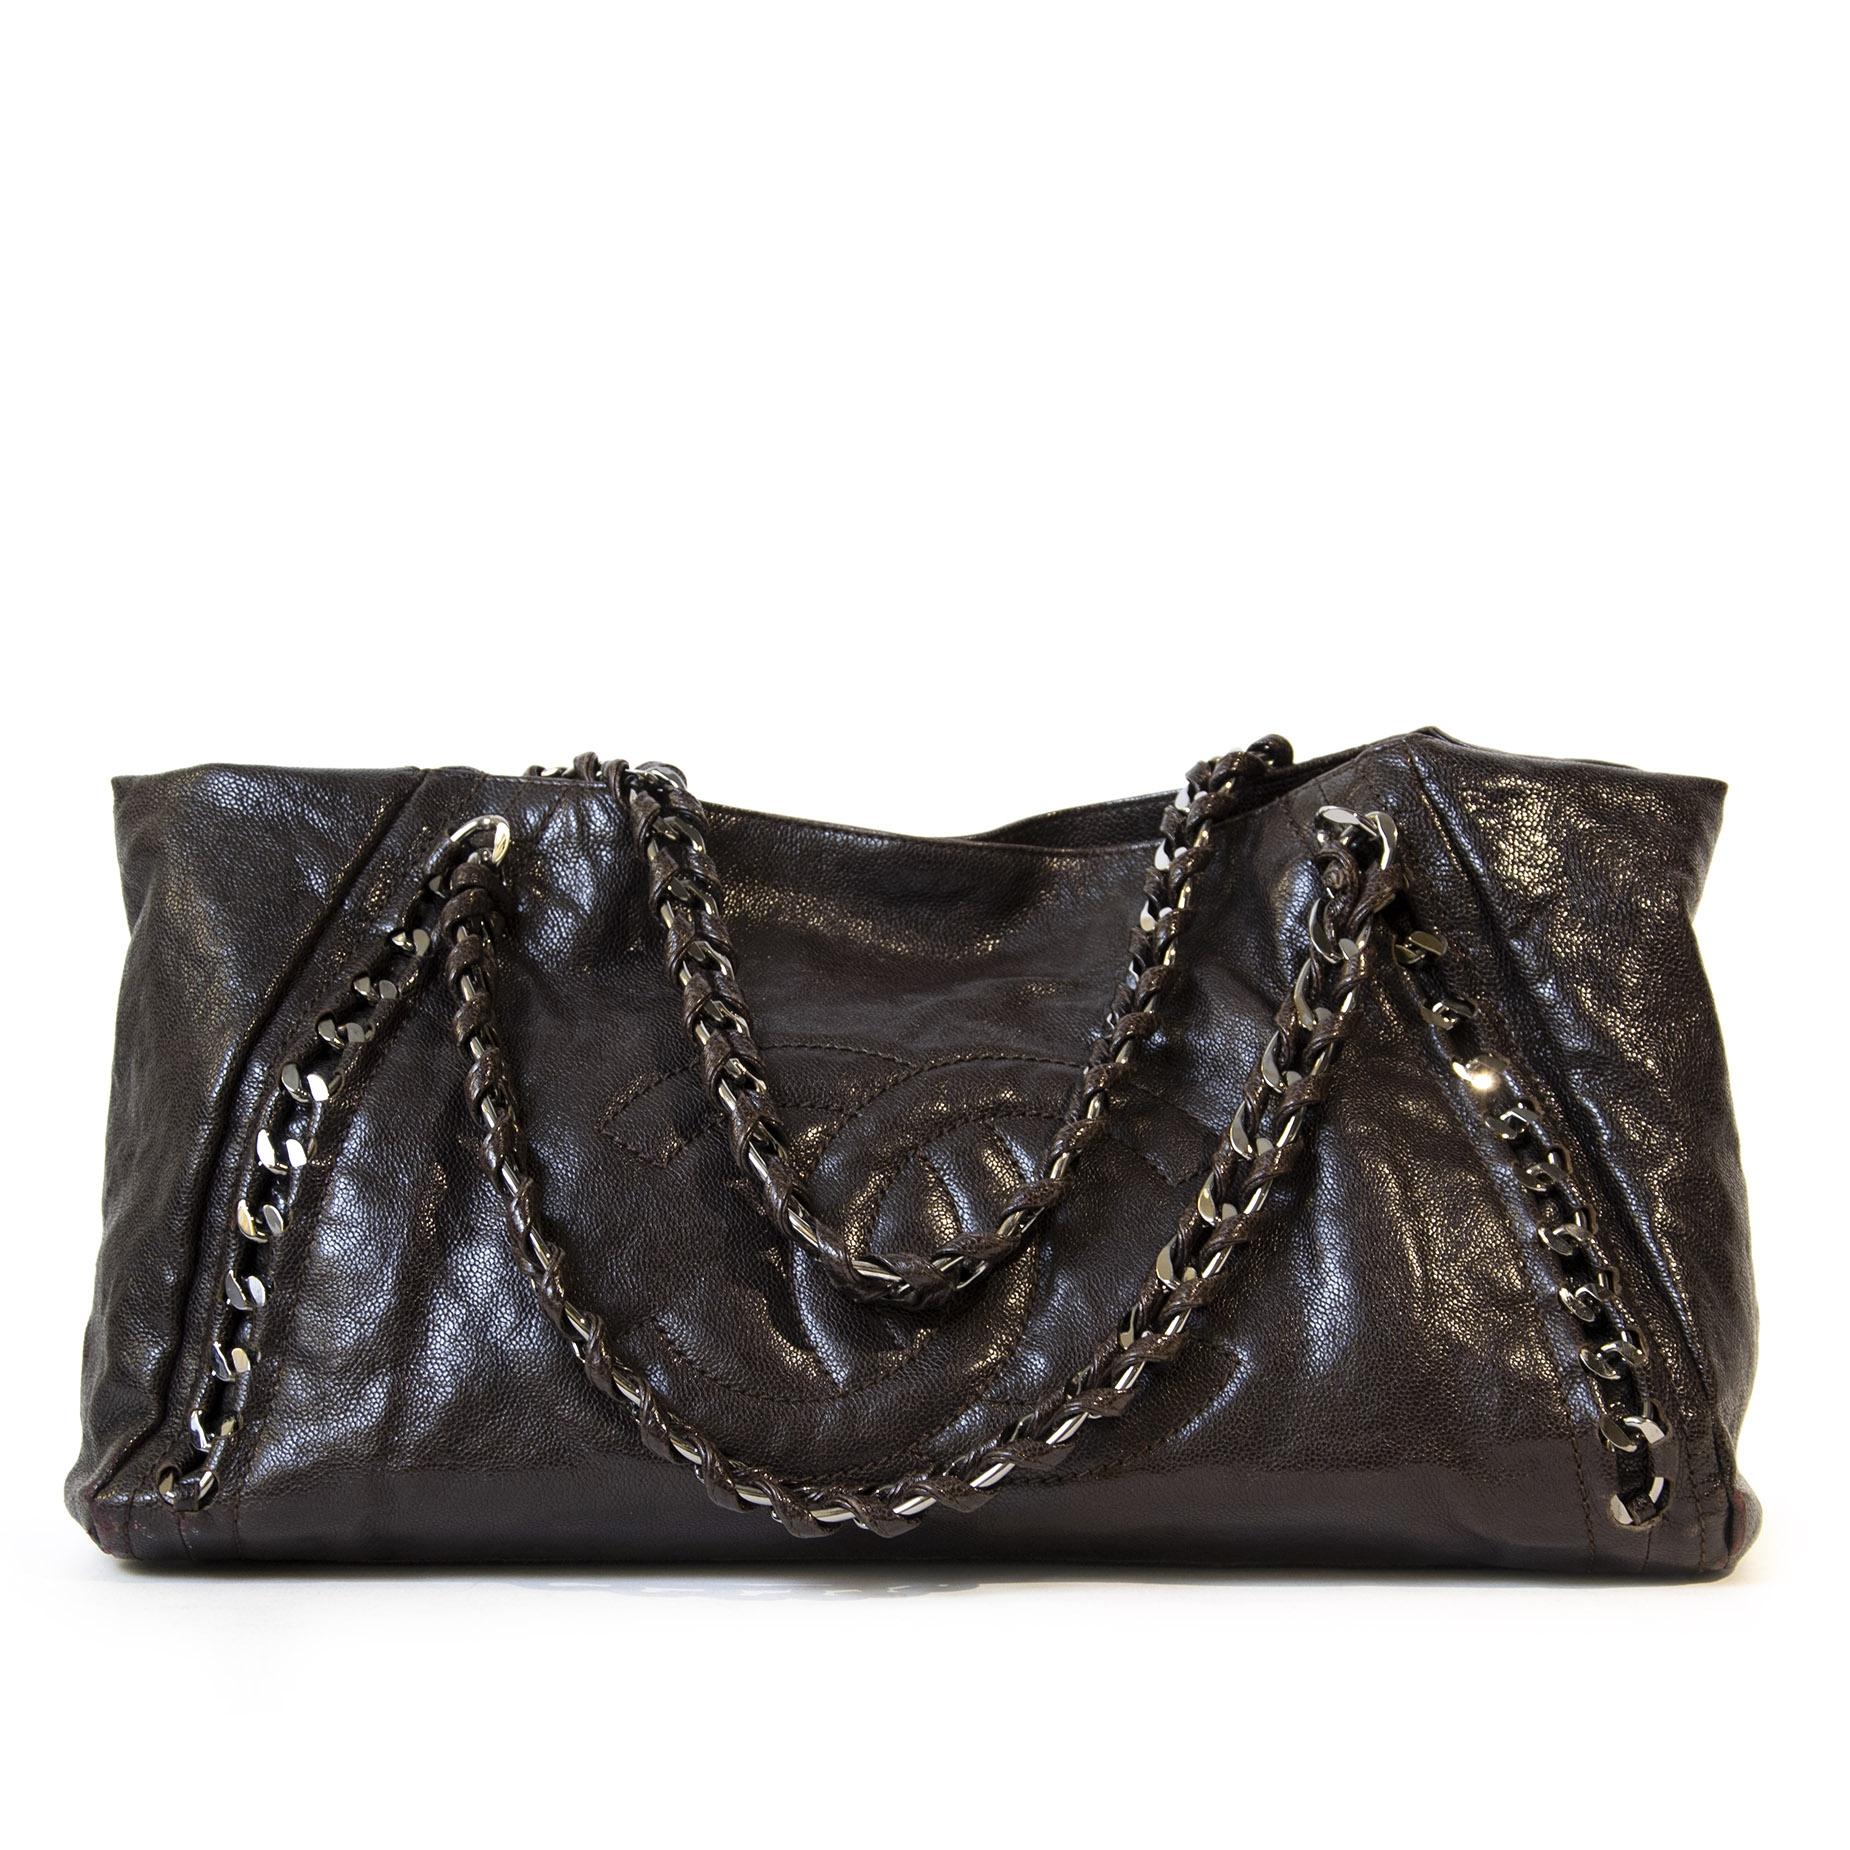 Authentieke tweedehands vintage Chanel Caviar Chain Shoulder Bag koop online webshop LabelLOV